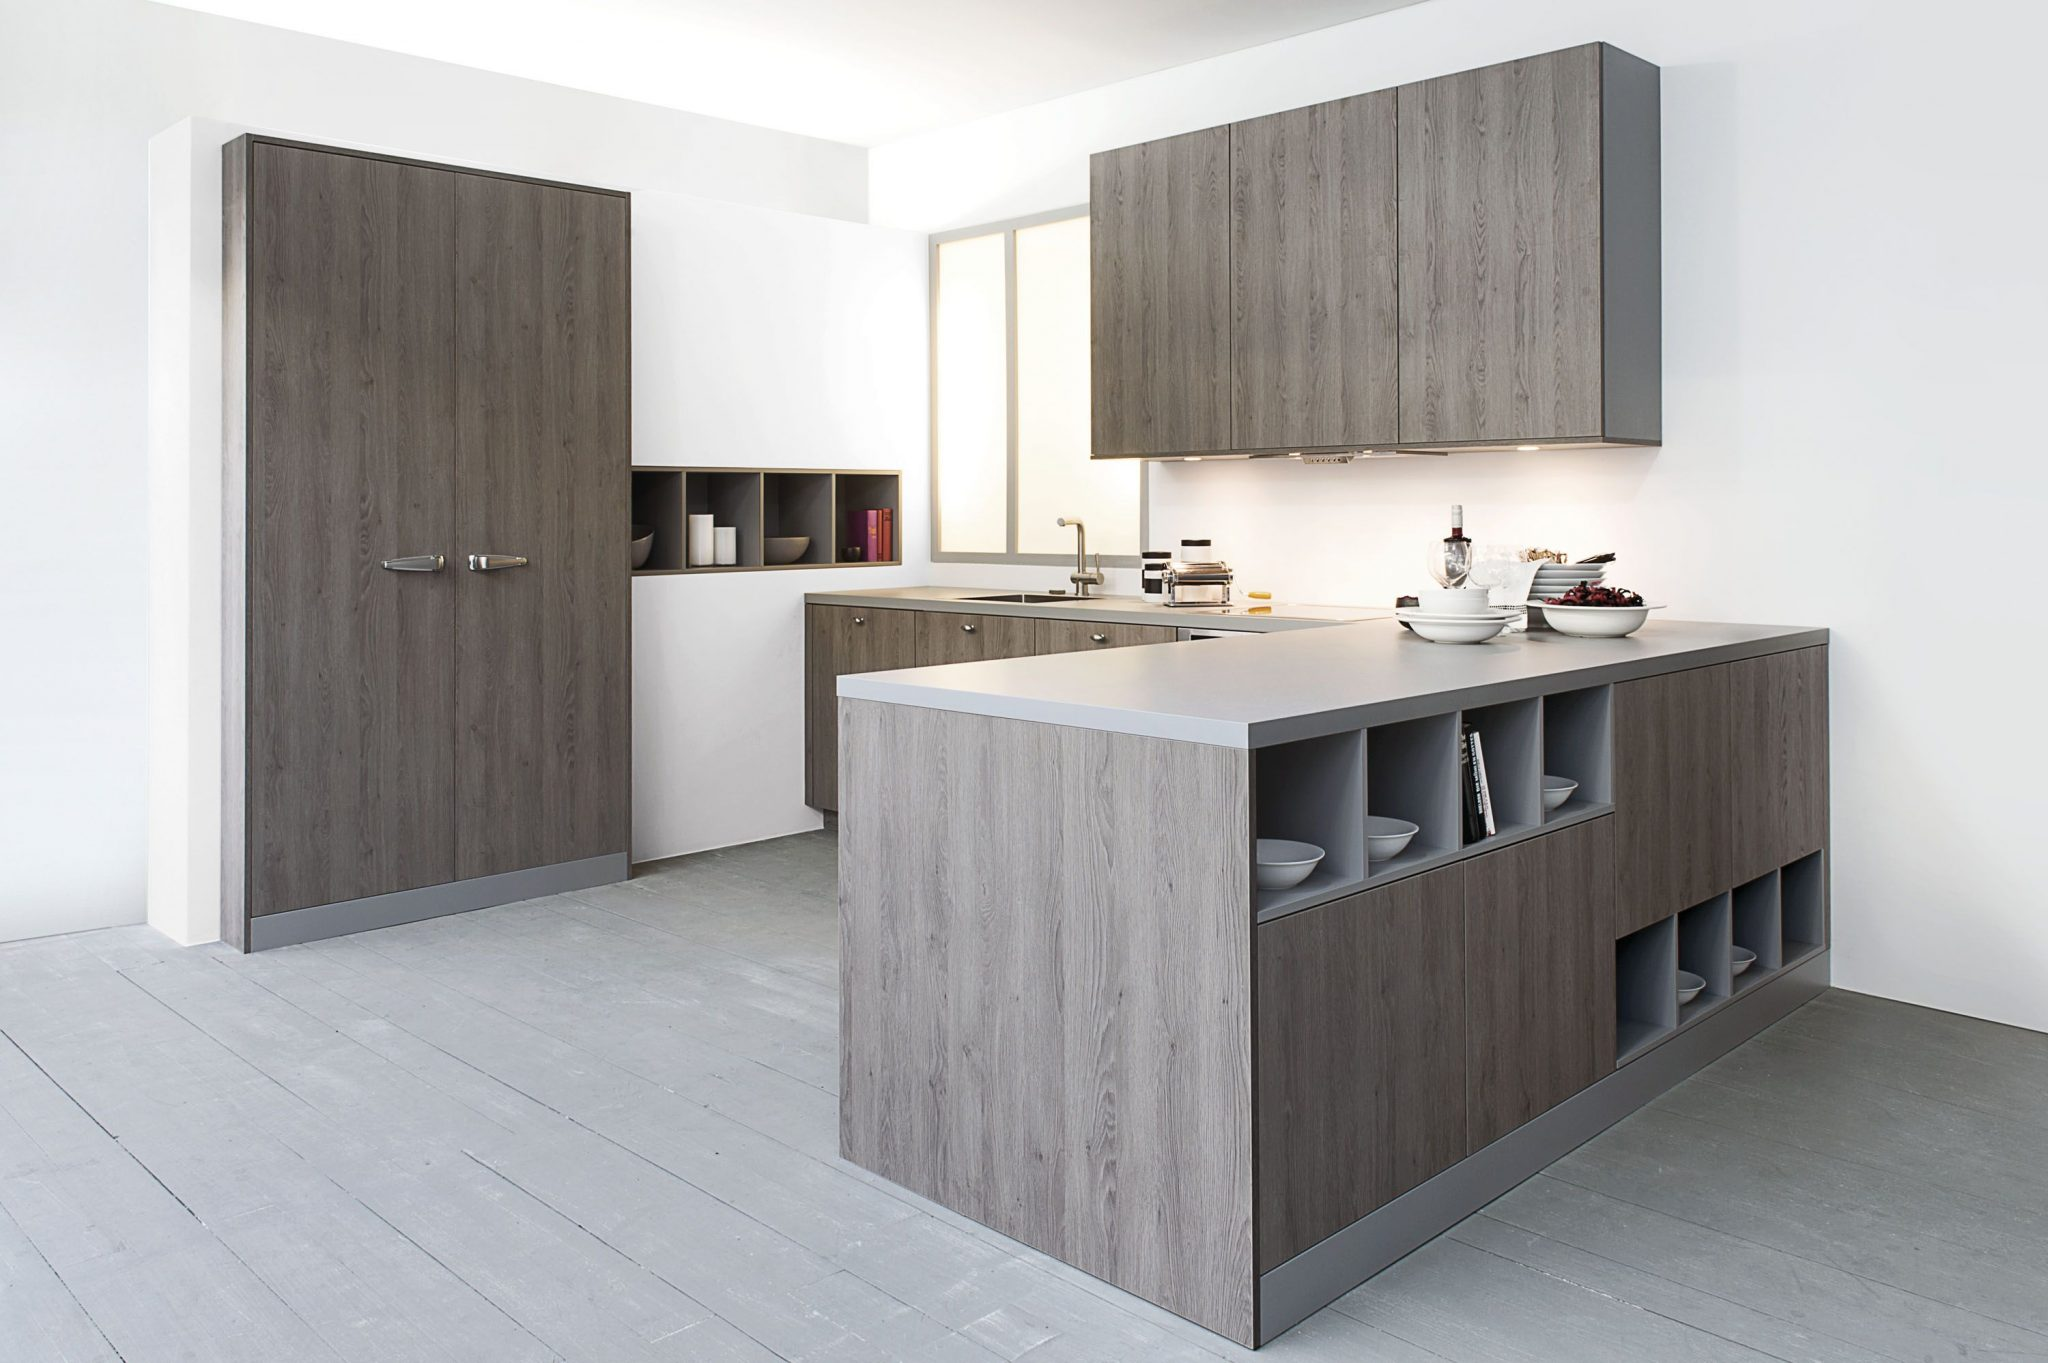 Strakke hout look keuken 7.5 bkb keukens